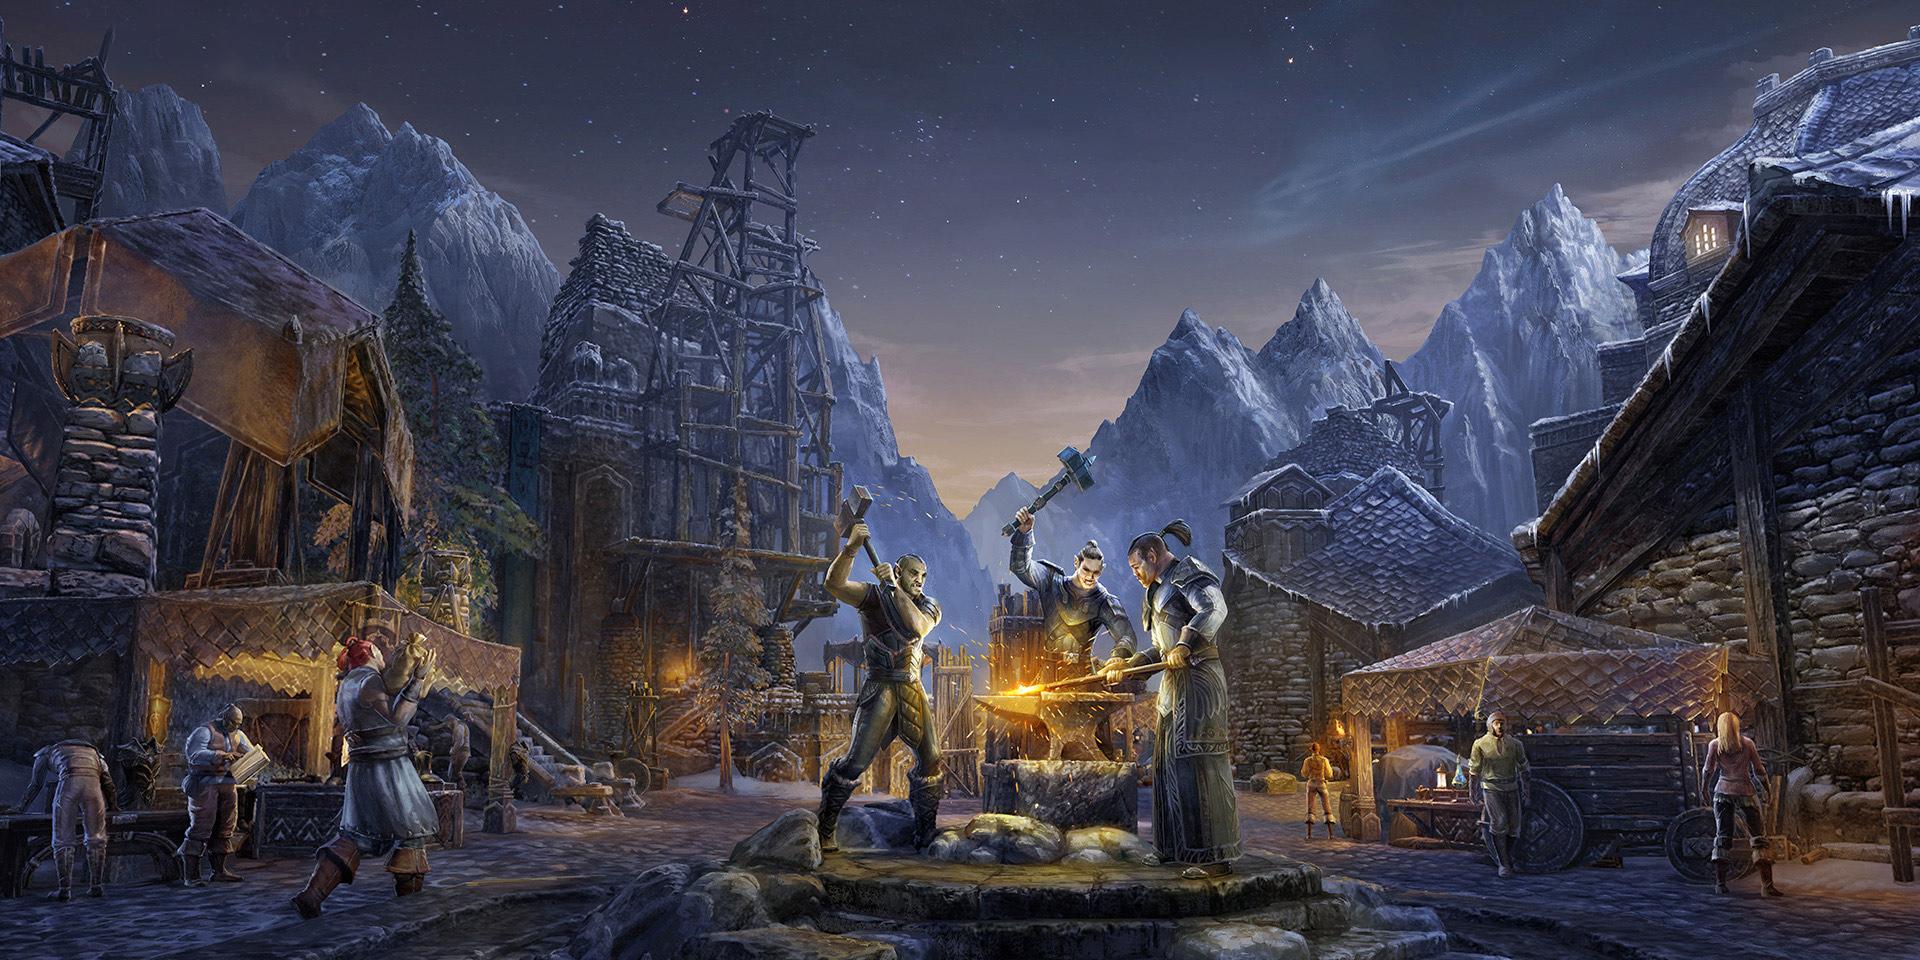 The Elder Scrolls Online: Место ремесленника и чувство